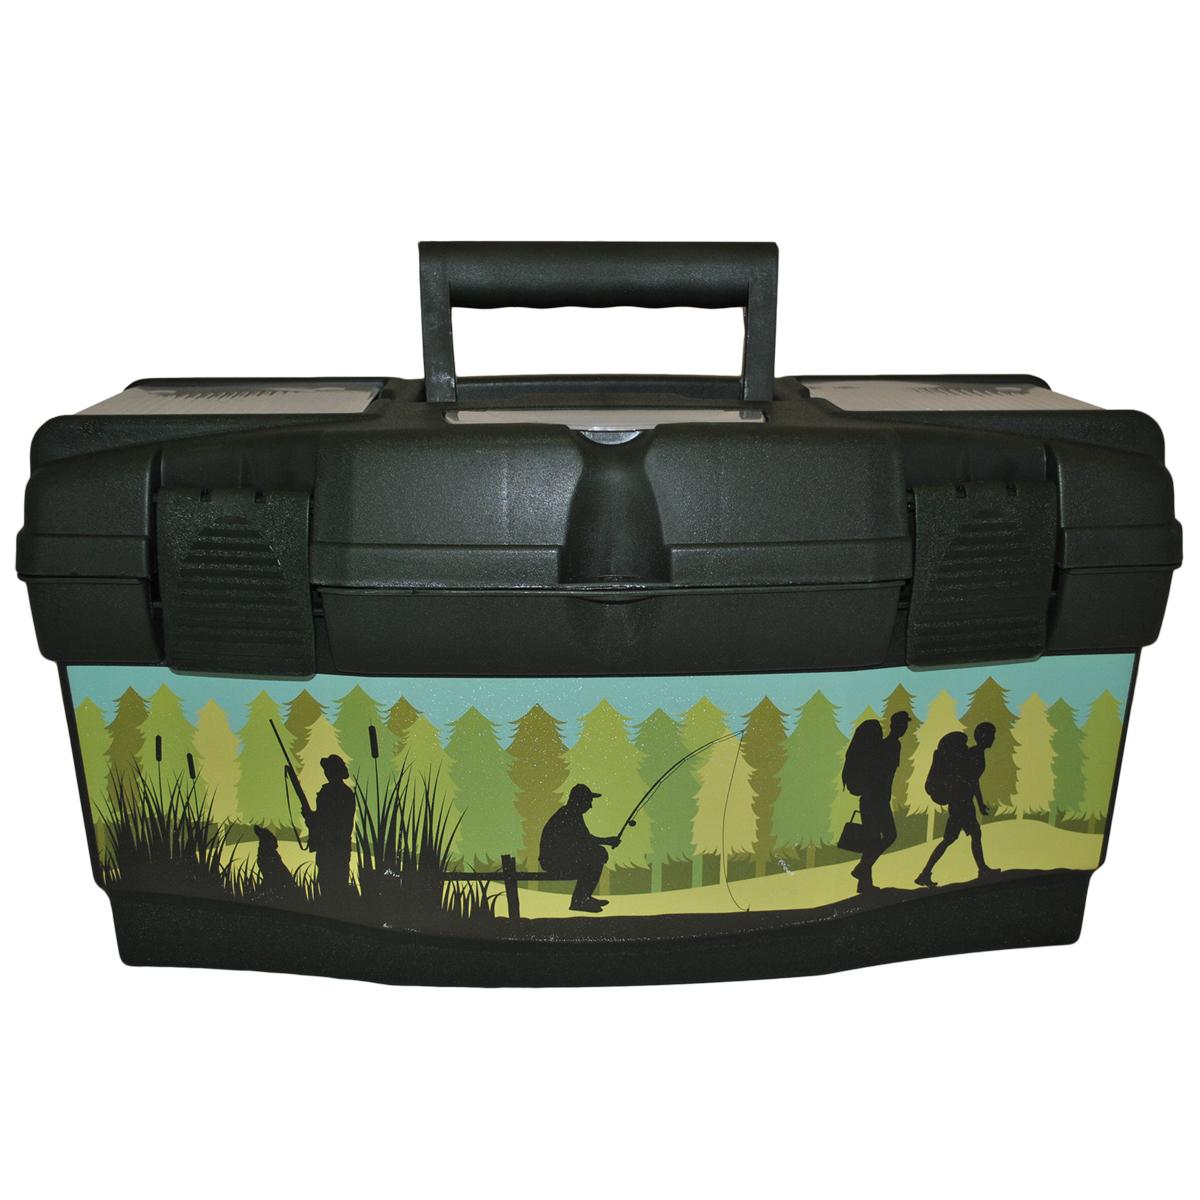 "Ящик для инструментов Blocker ""Master Tour. Рыбак"", цвет: темно-зеленый, 485 х 250 х 245 мм BR3794ТЗЛ-Рыбак"